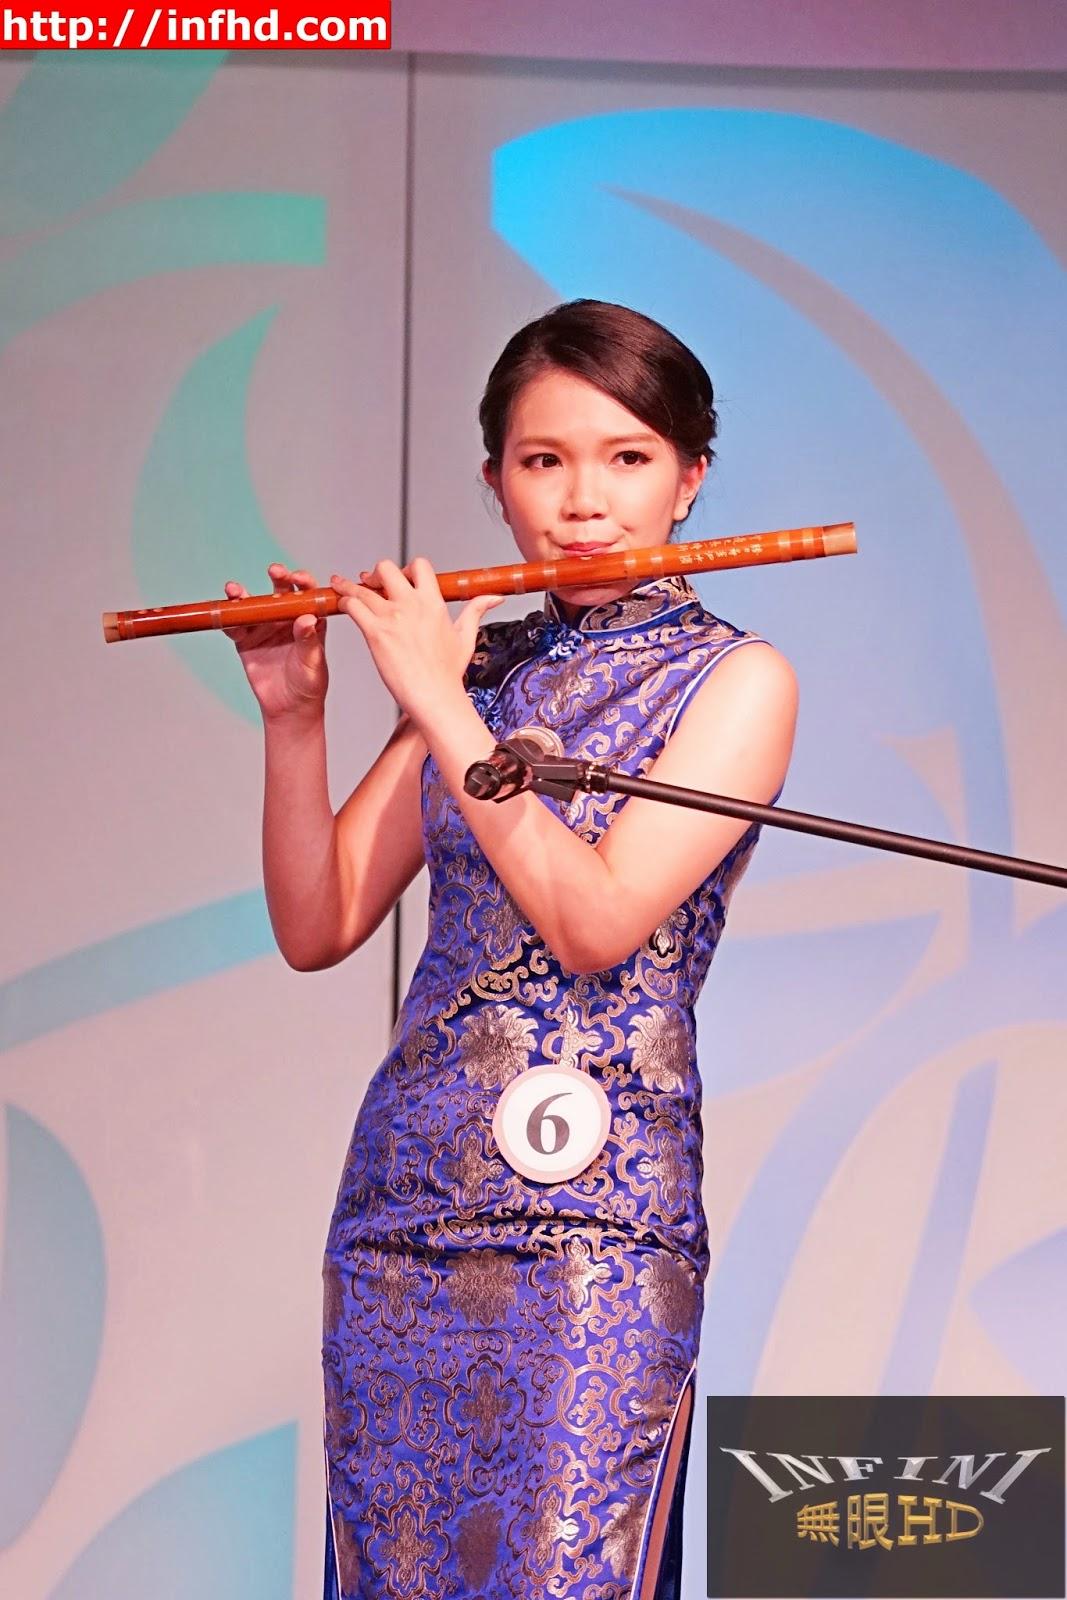 Miss Earth 2011 Update: Taiwan Wins Miss Photogenic Award